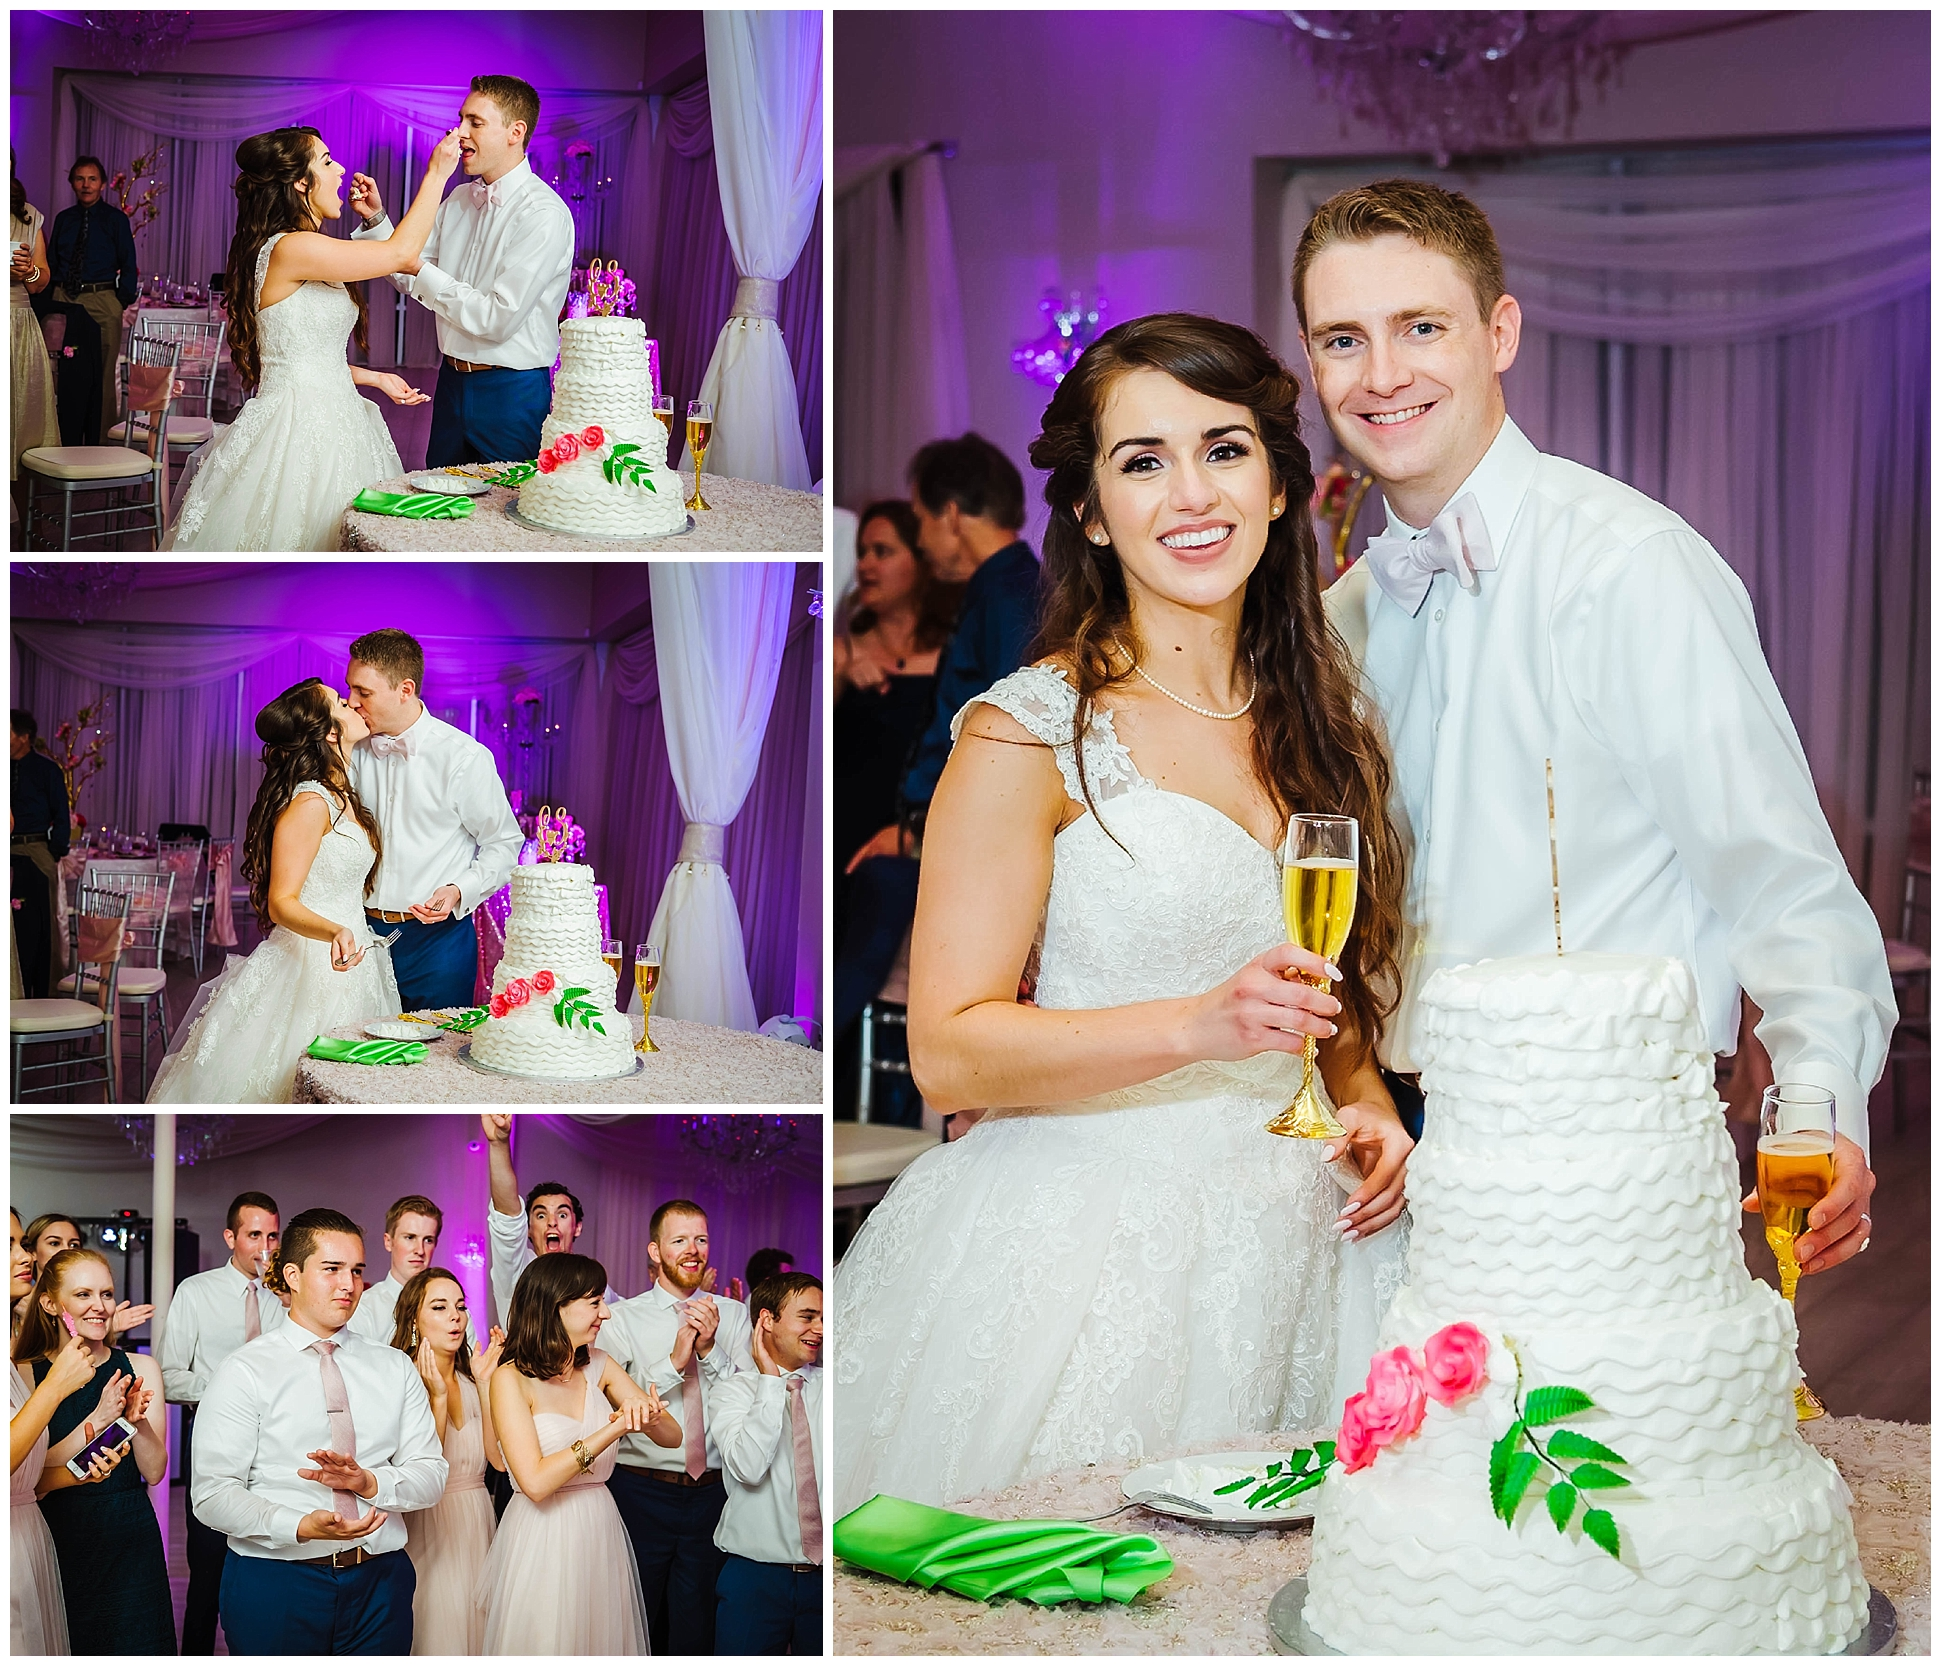 st-pete-wedding-photographer-sunken-gardens-crystal-ballroom-princess-dancer_0201.jpg